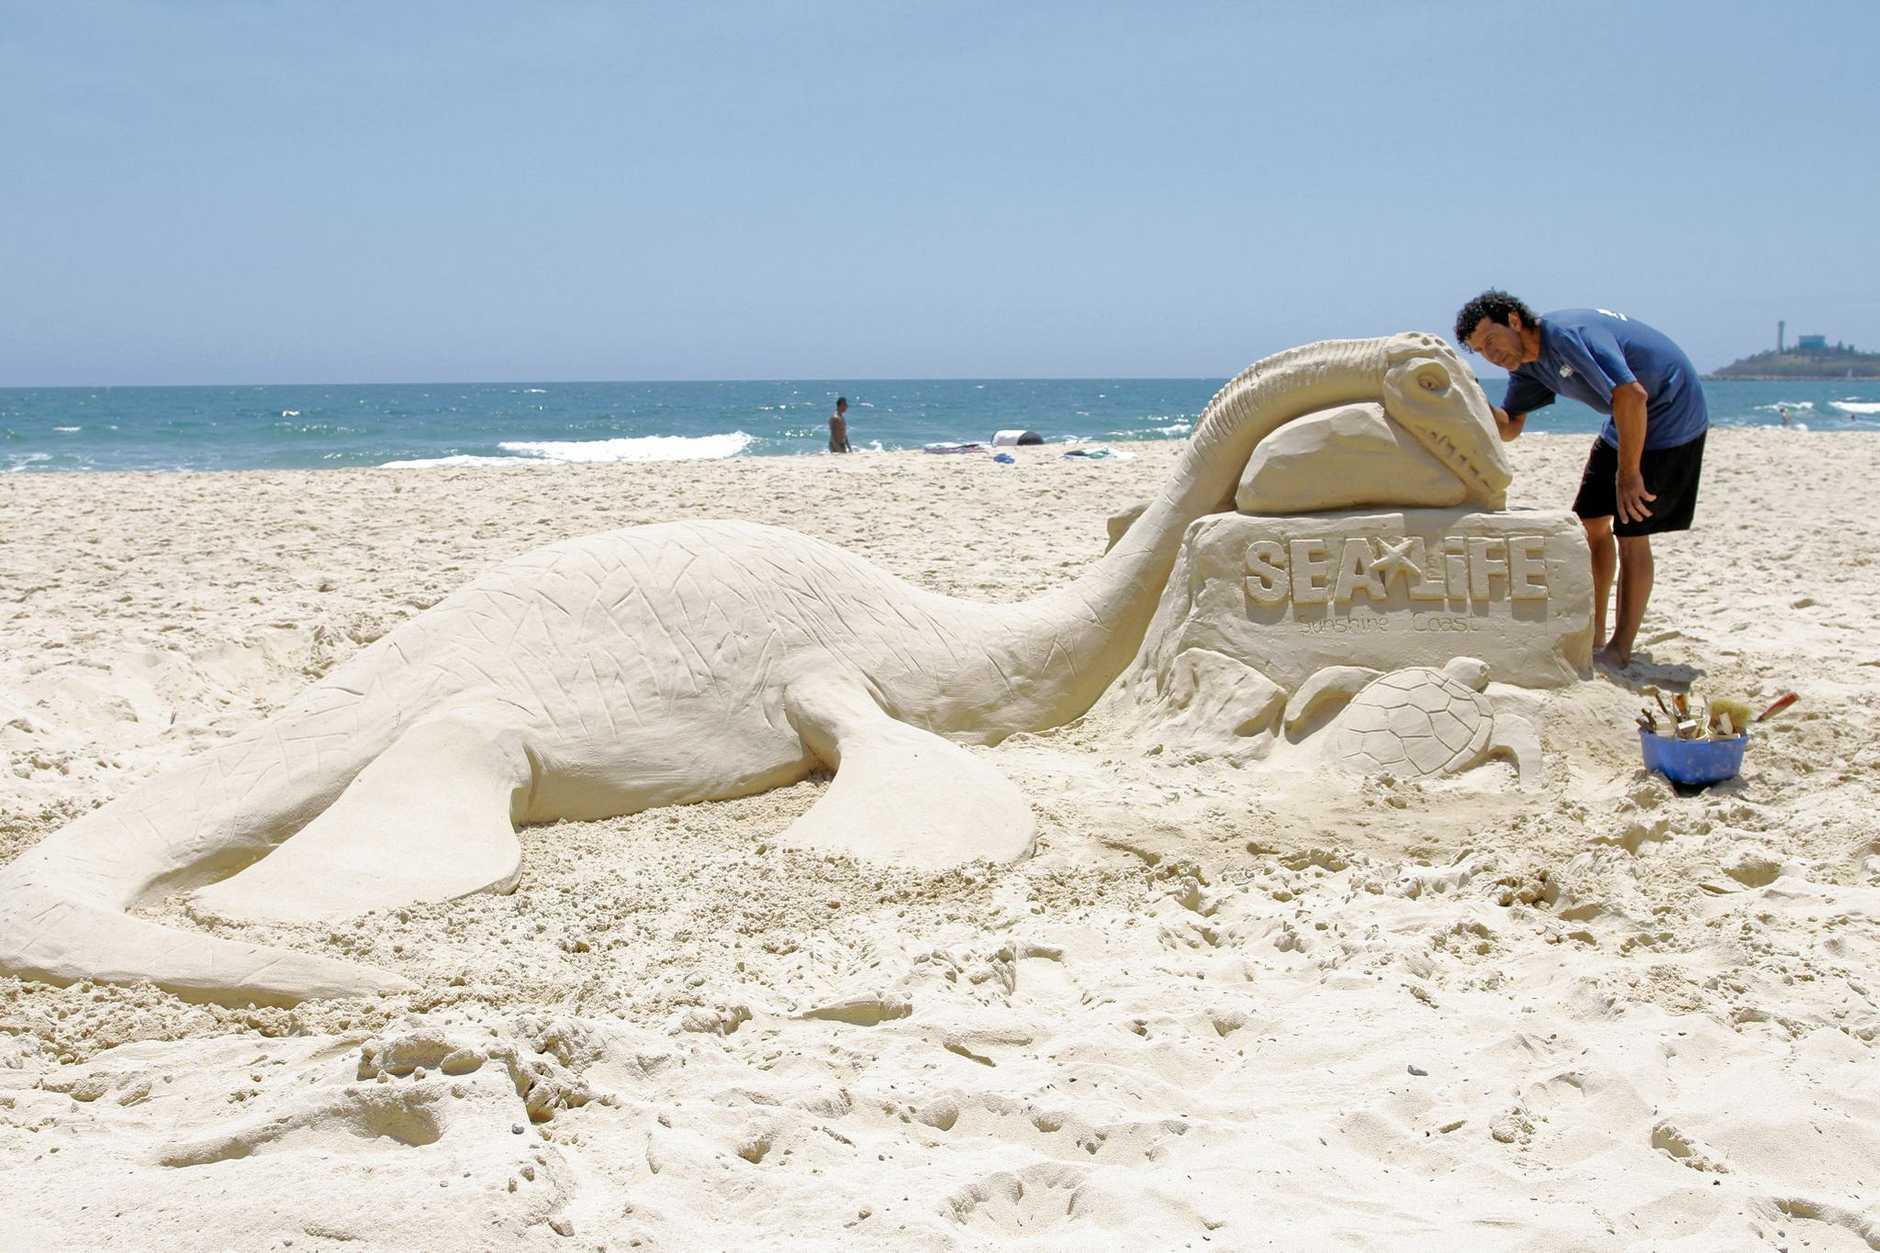 Peter Papamanolis with the Jurassic Seas sculpture.